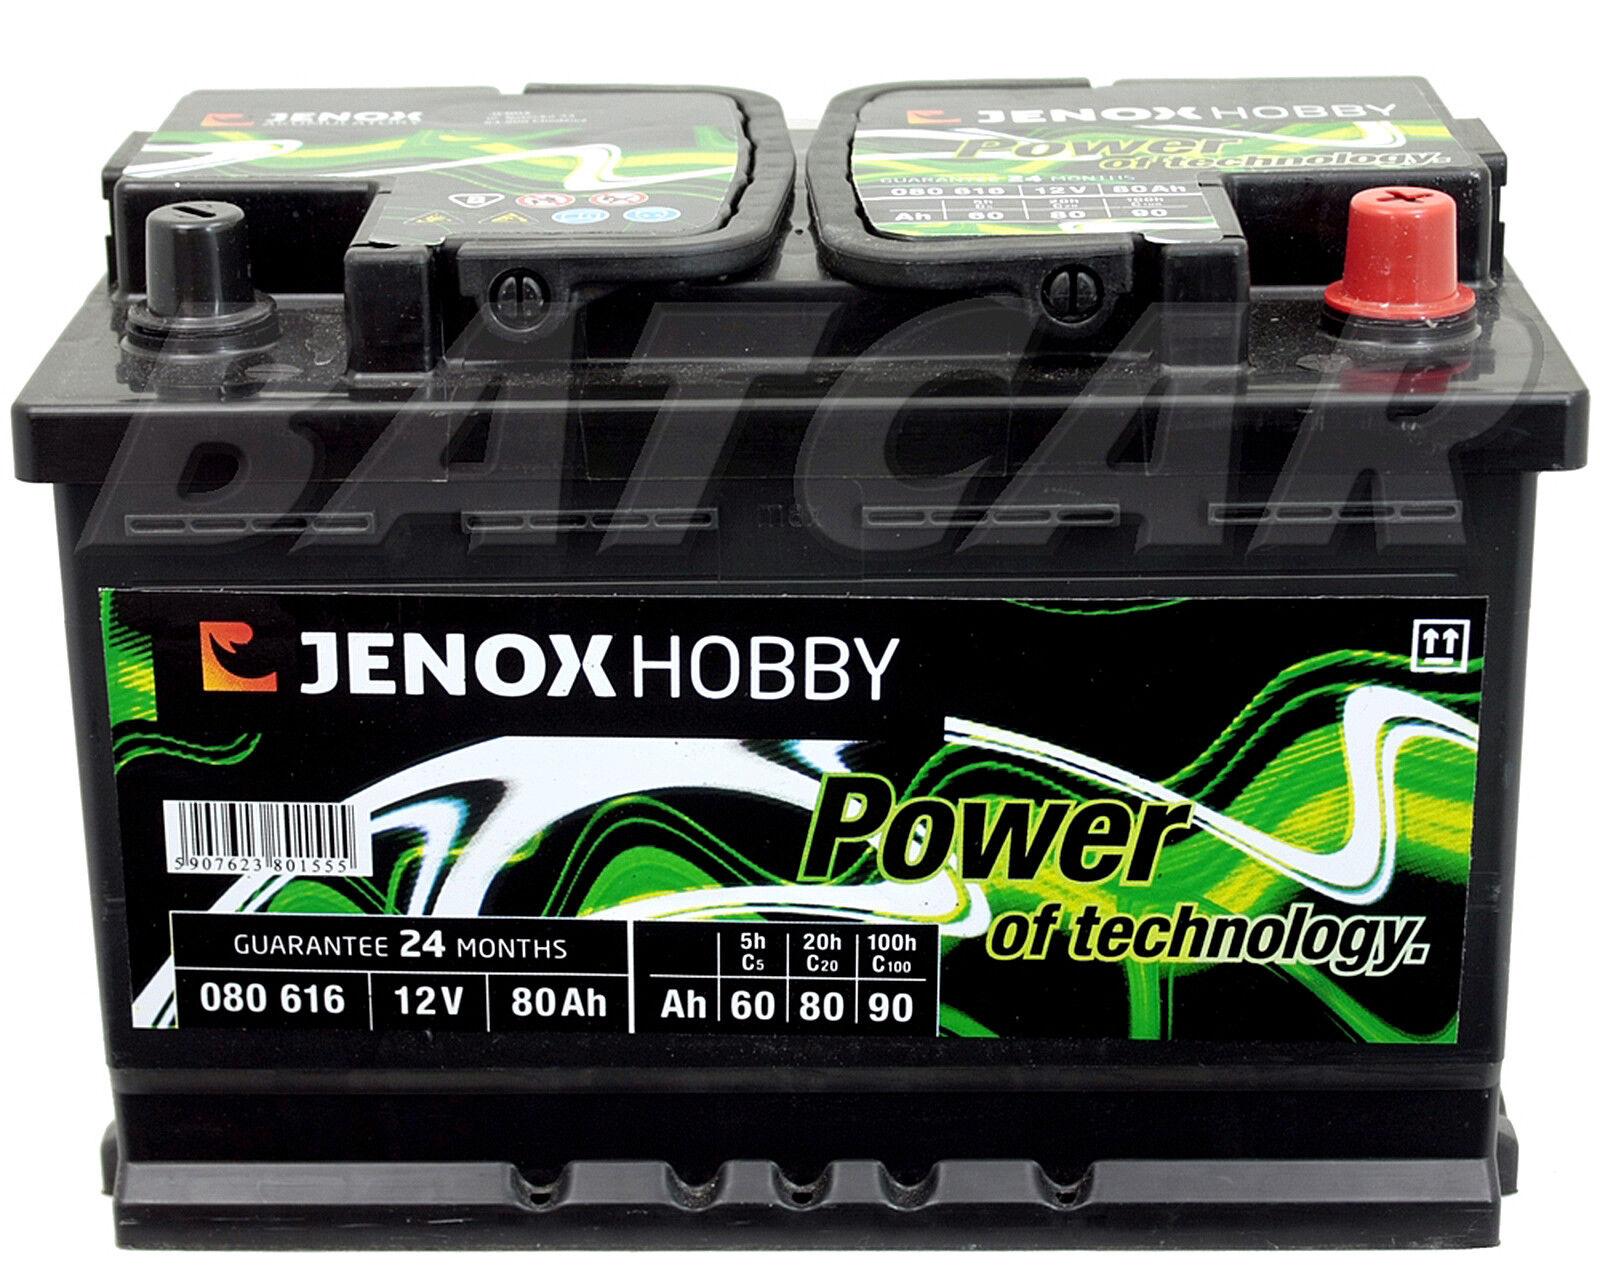 2 X Solarbatterie Jenox Hobby 12V 80 Ah 80Ah Wohnmobil, Solarakku,